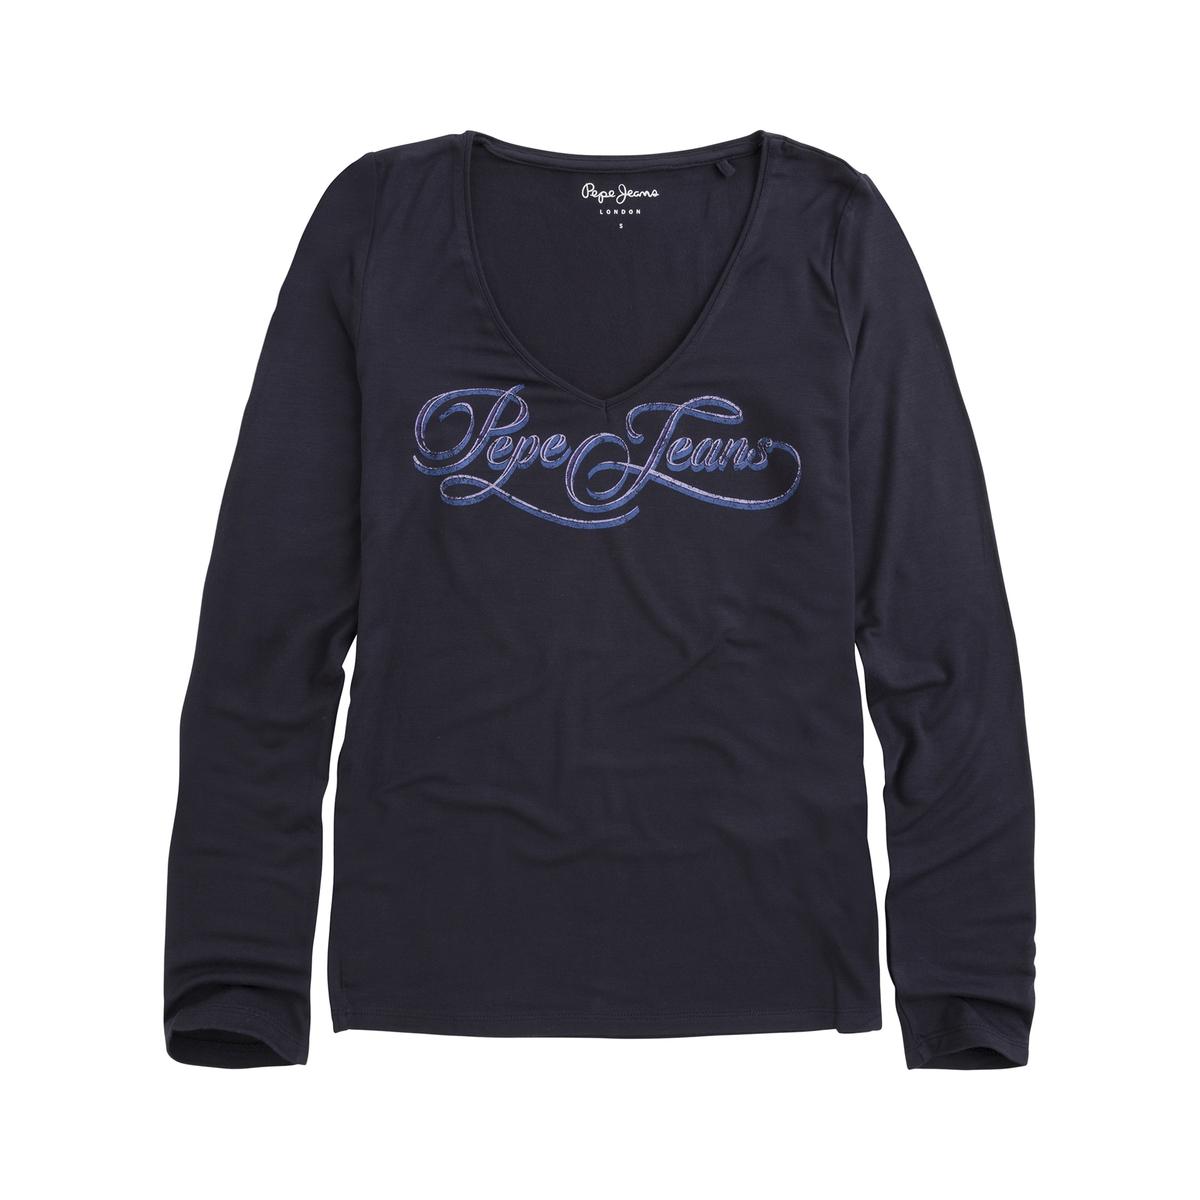 цена Футболка La Redoute С длинными рукавами и рисунком спереди Marlne XS синий в интернет-магазинах